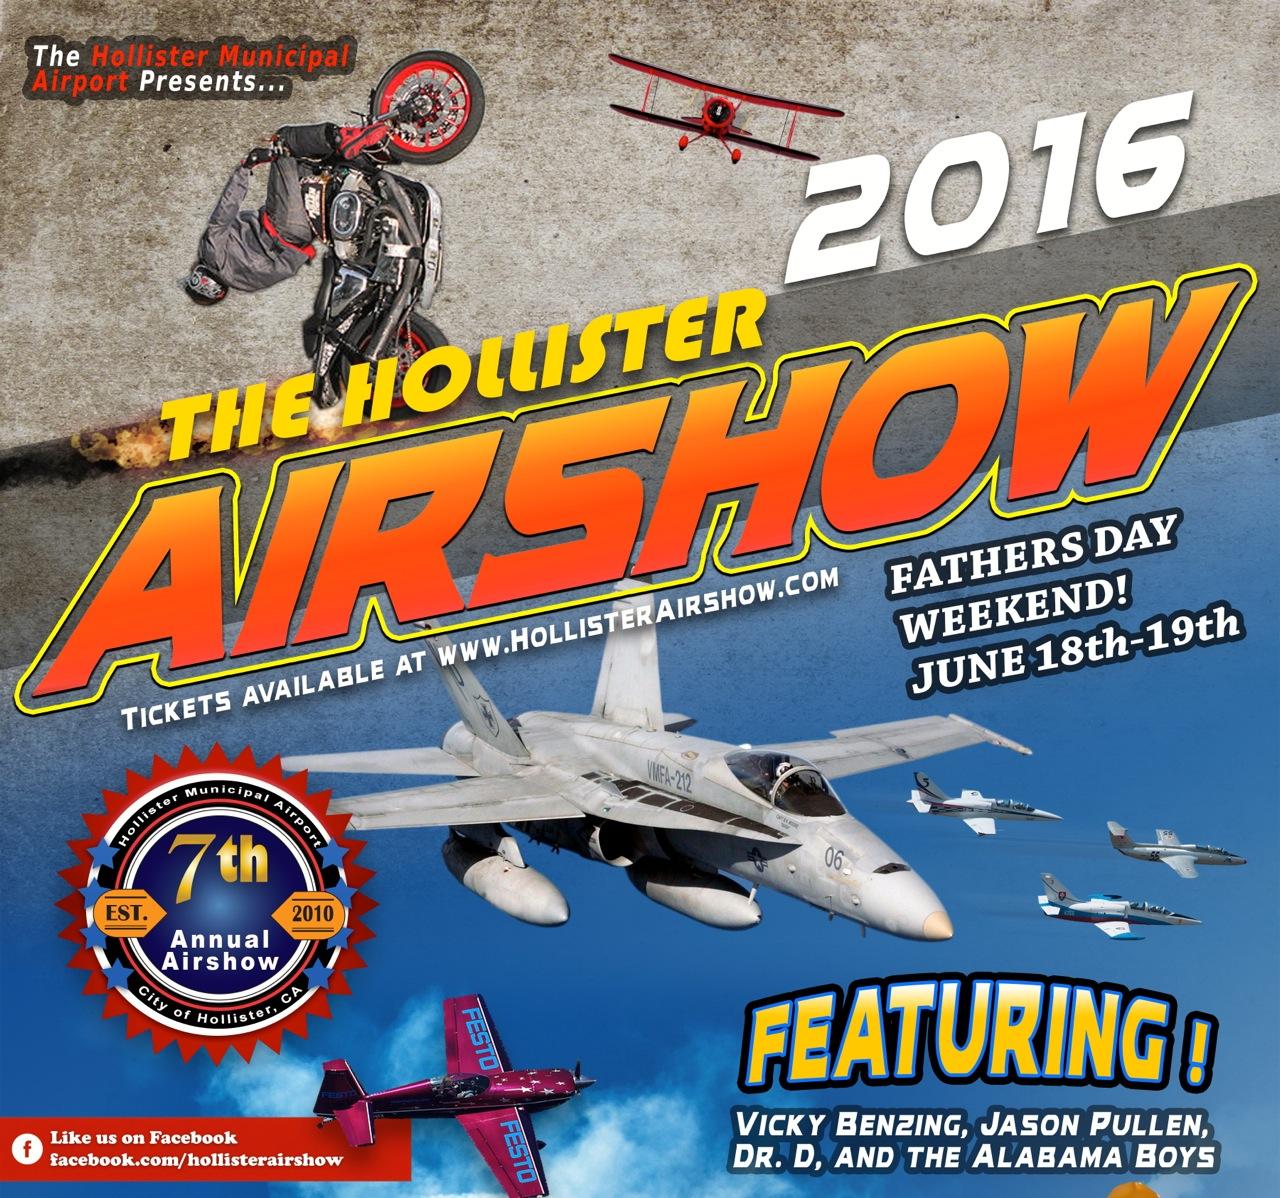 2016 Airshow lg.jpg